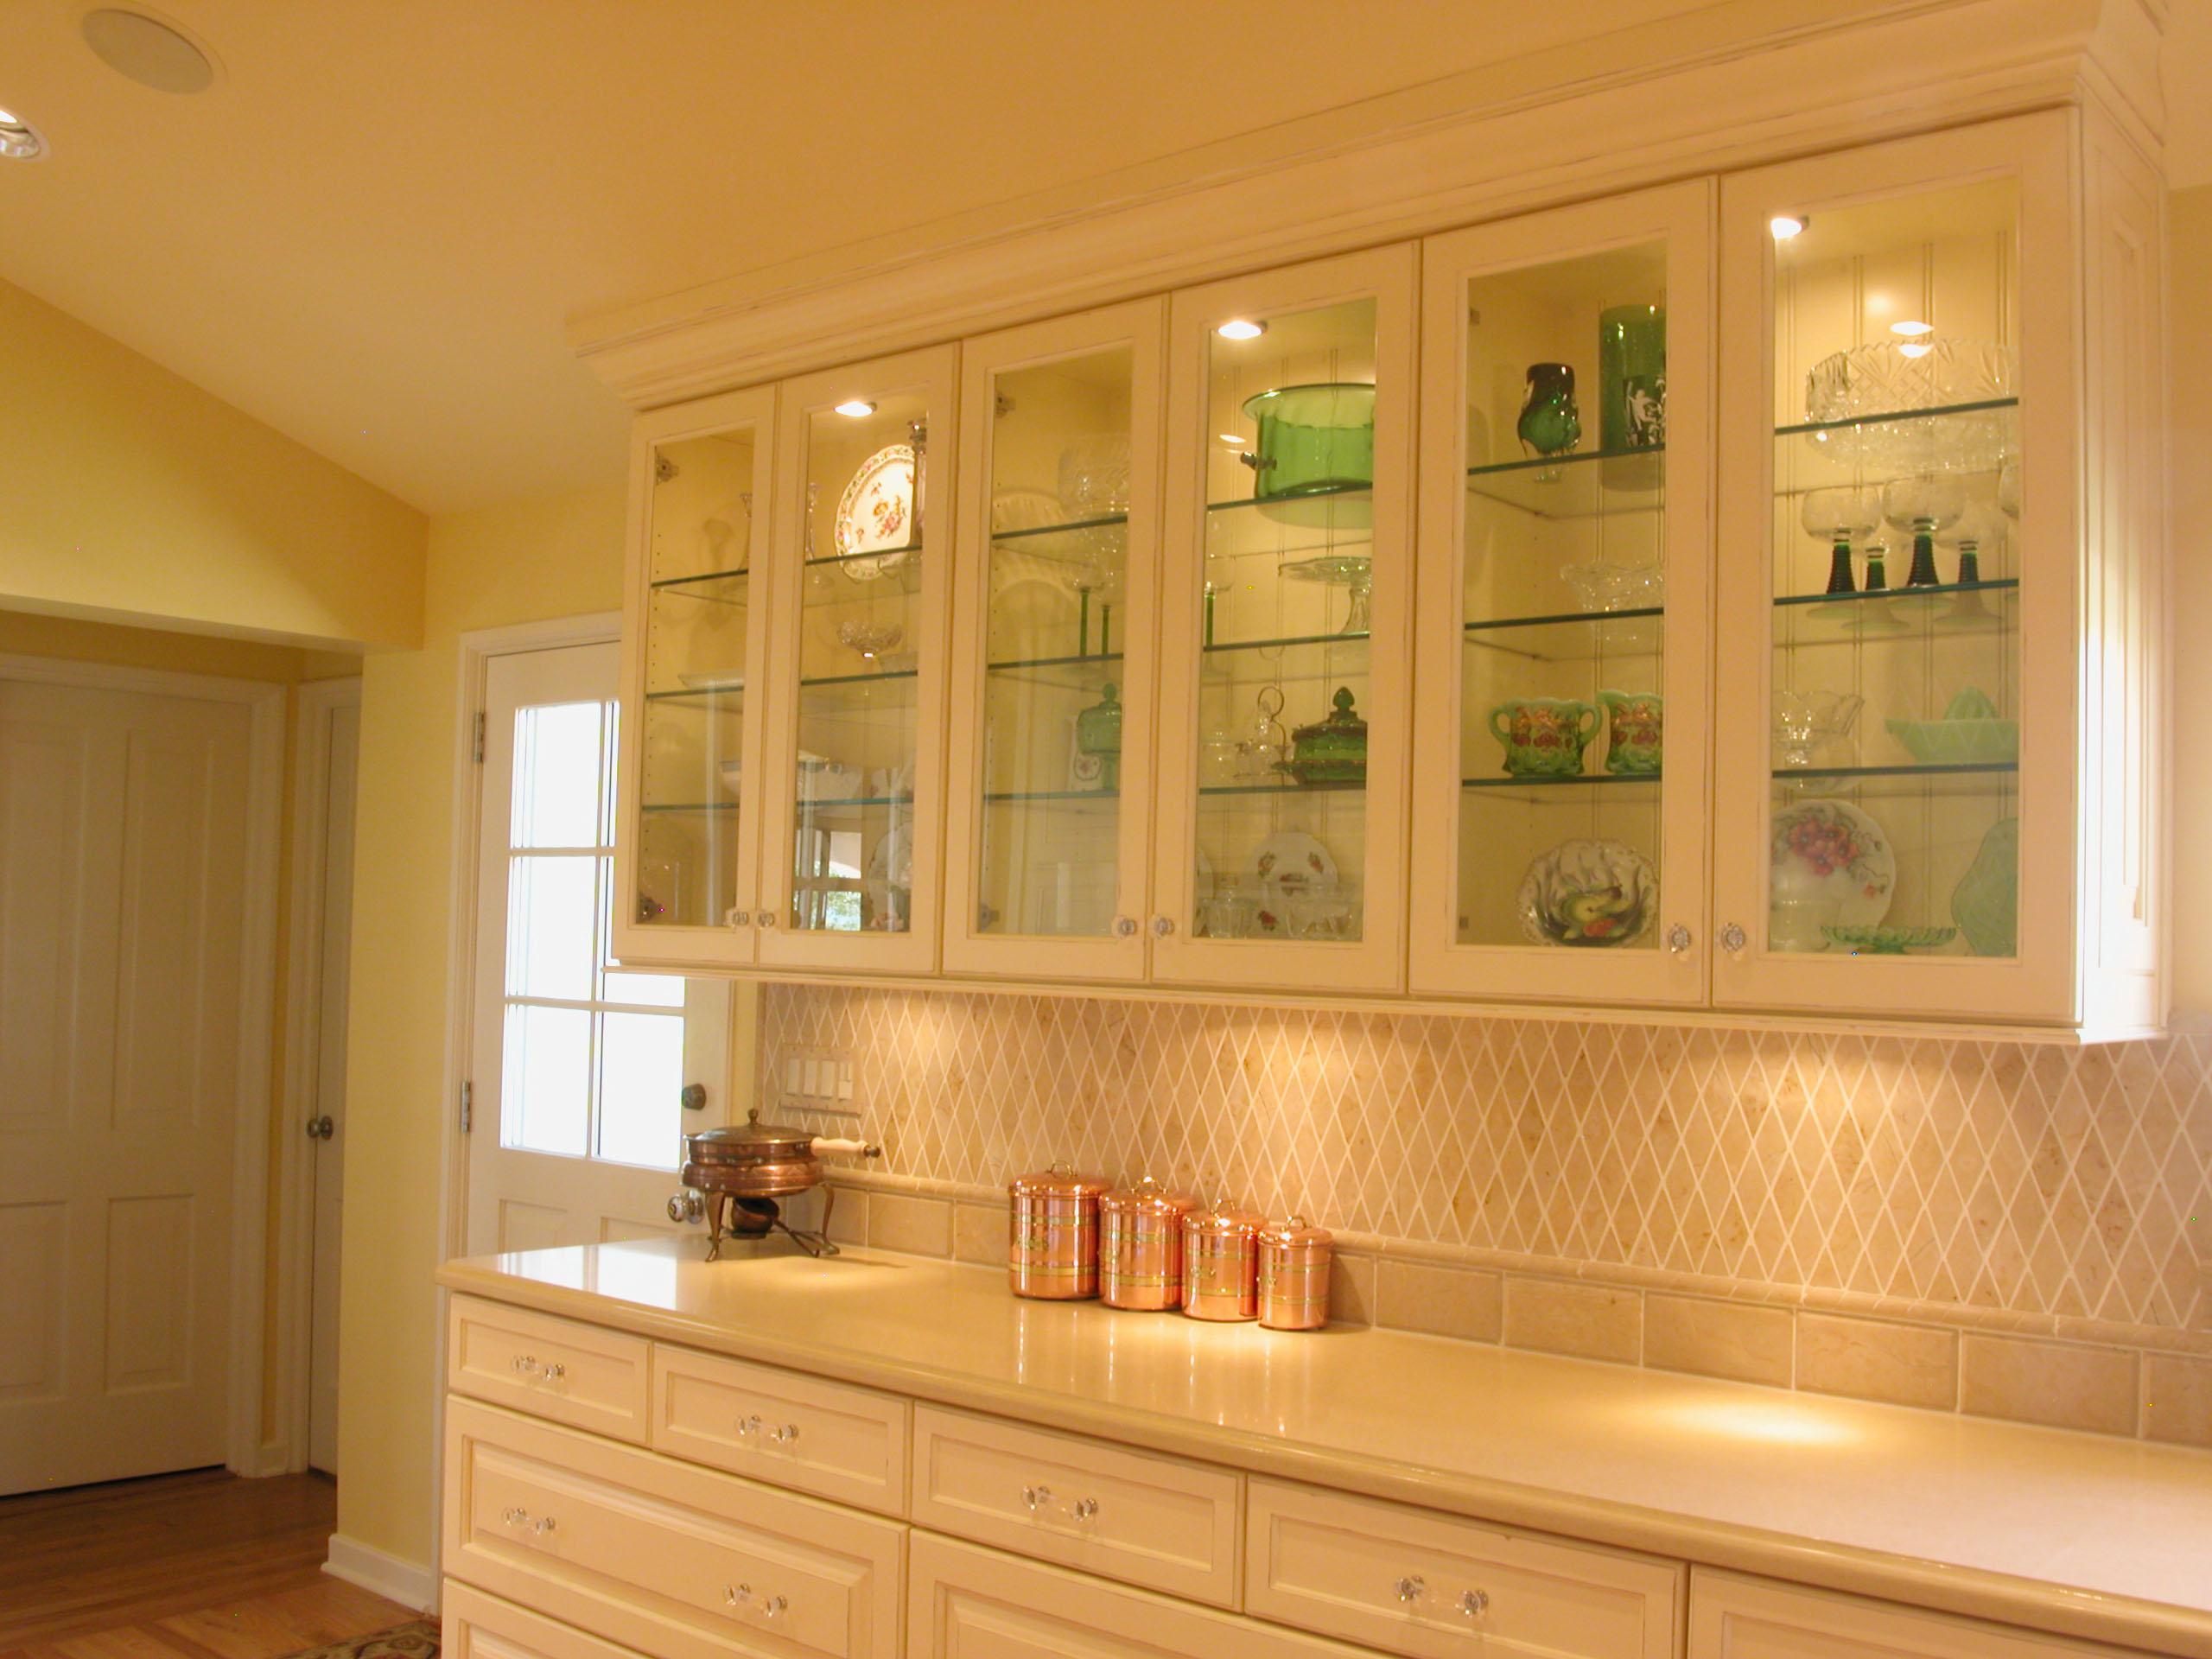 Home Remodel RNB Design Group Wisconsin Home Remodeling Contractors - Bathroom remodeling menomonee falls wi